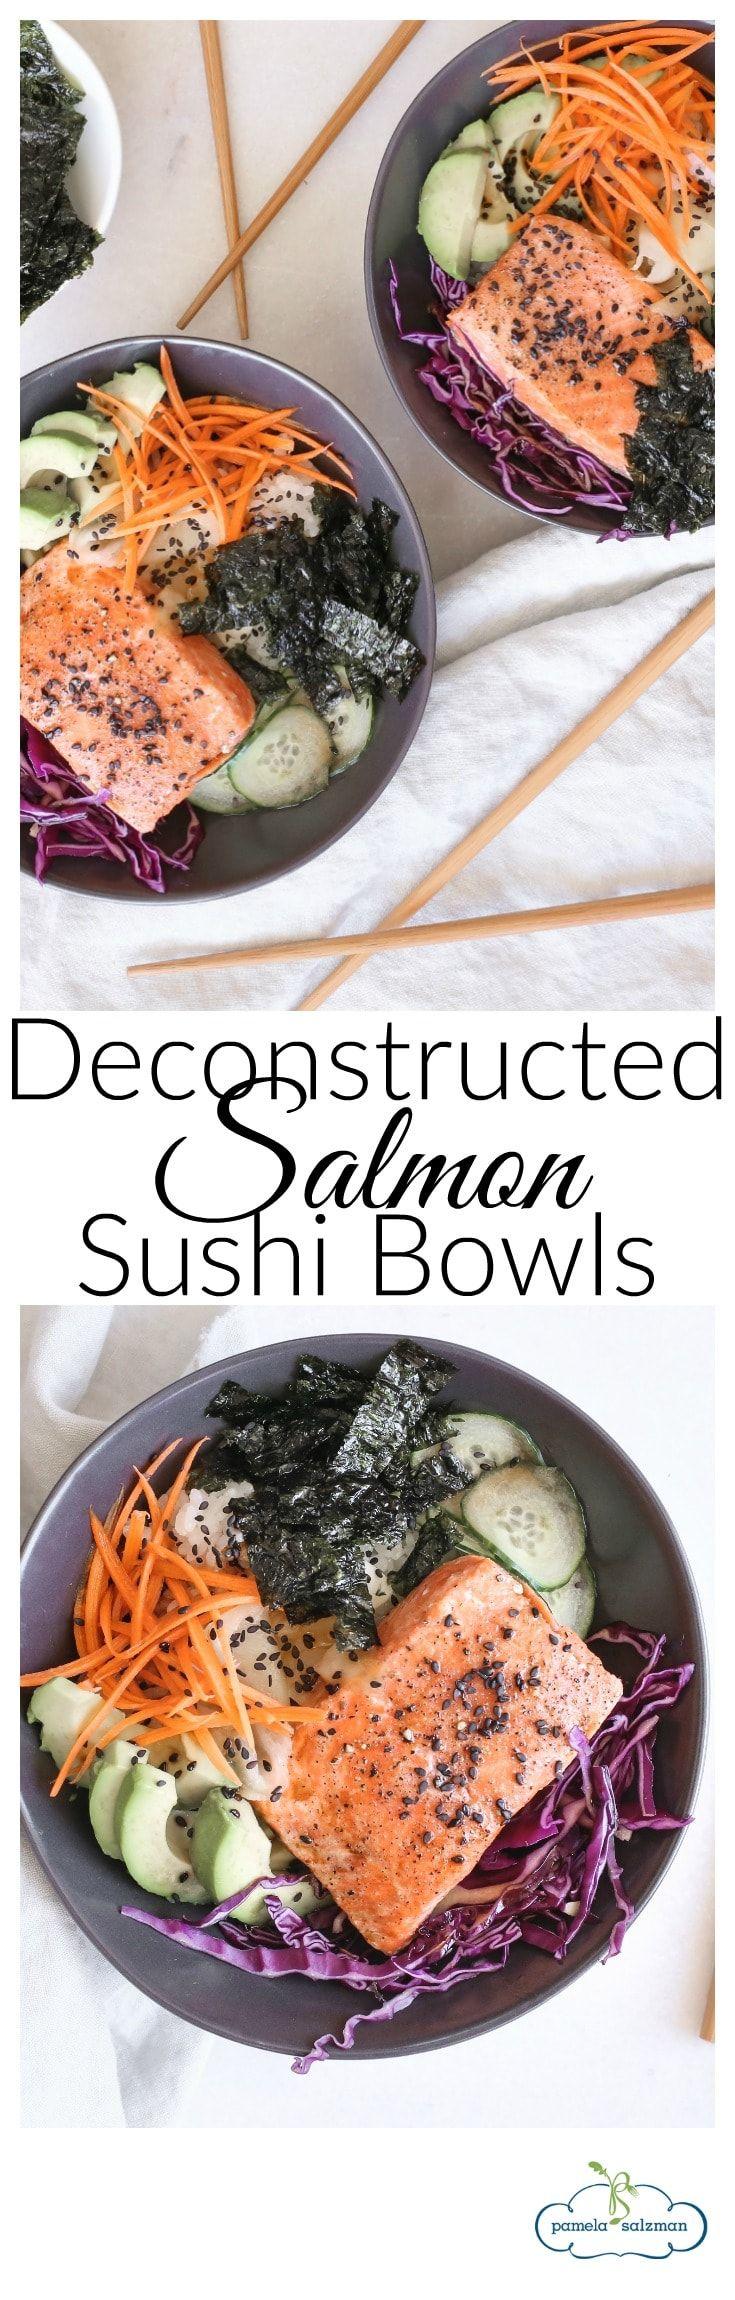 Deconstructed Salmon Sushi Bowls  Pamela Salzman